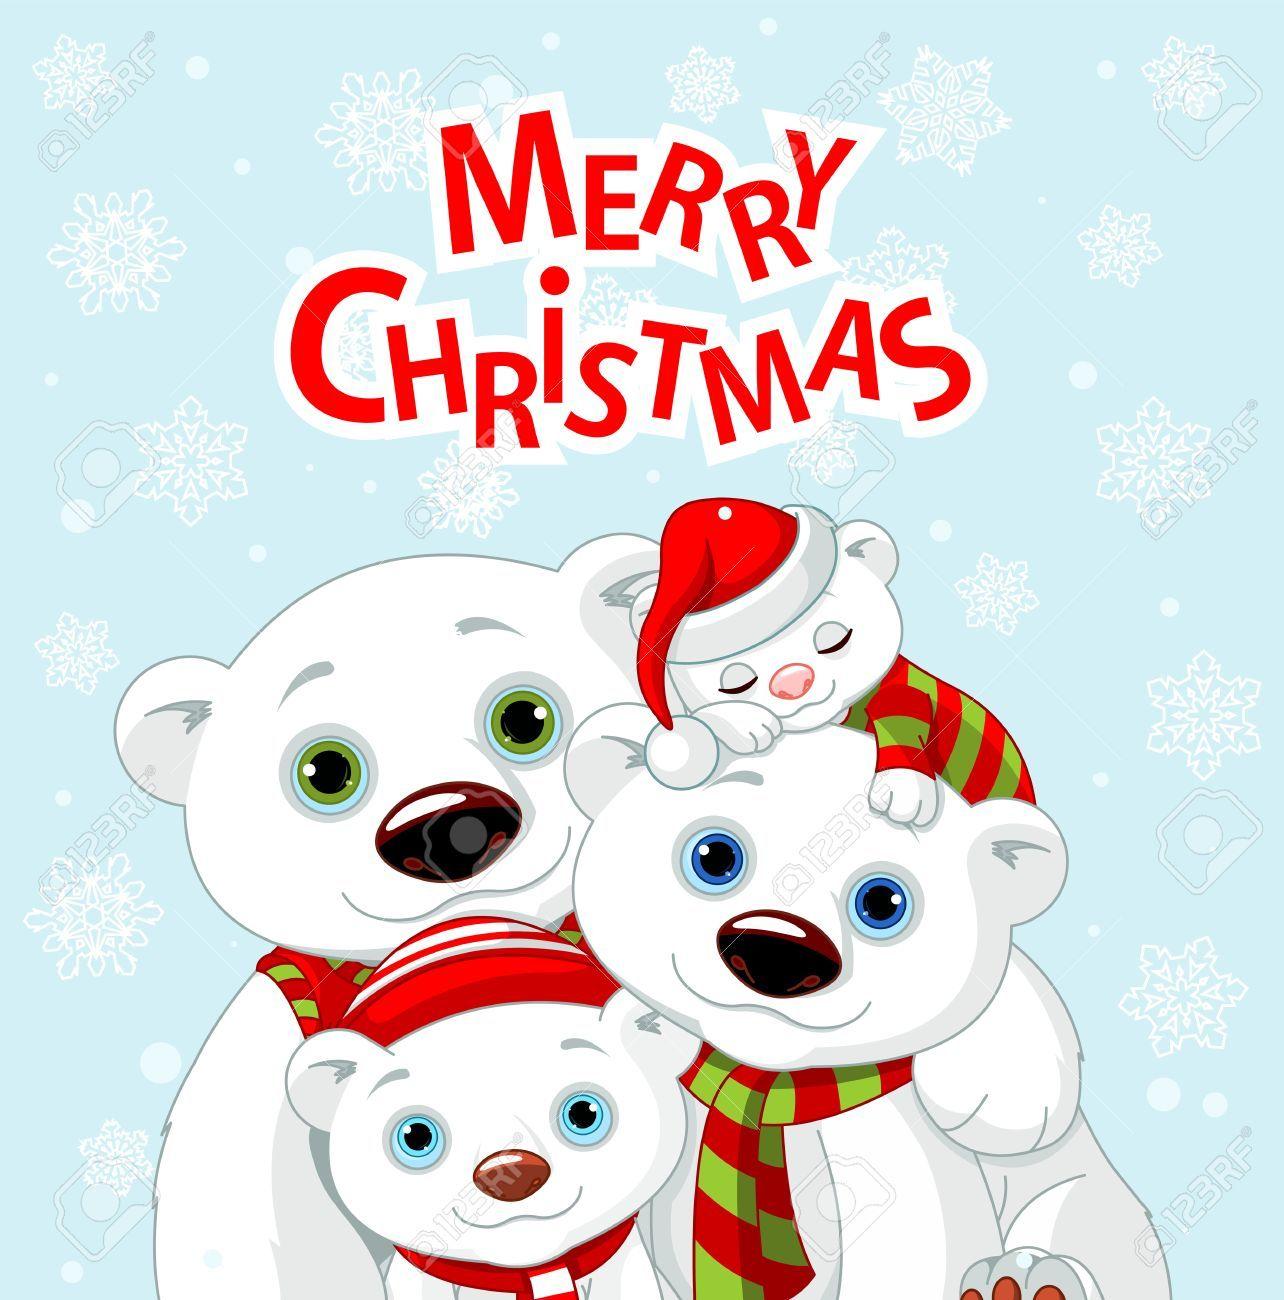 Resultado De Imagen Para Familia De Osos Navidad Family Christmas Greetings Polar Bear Card Christmas Clipart